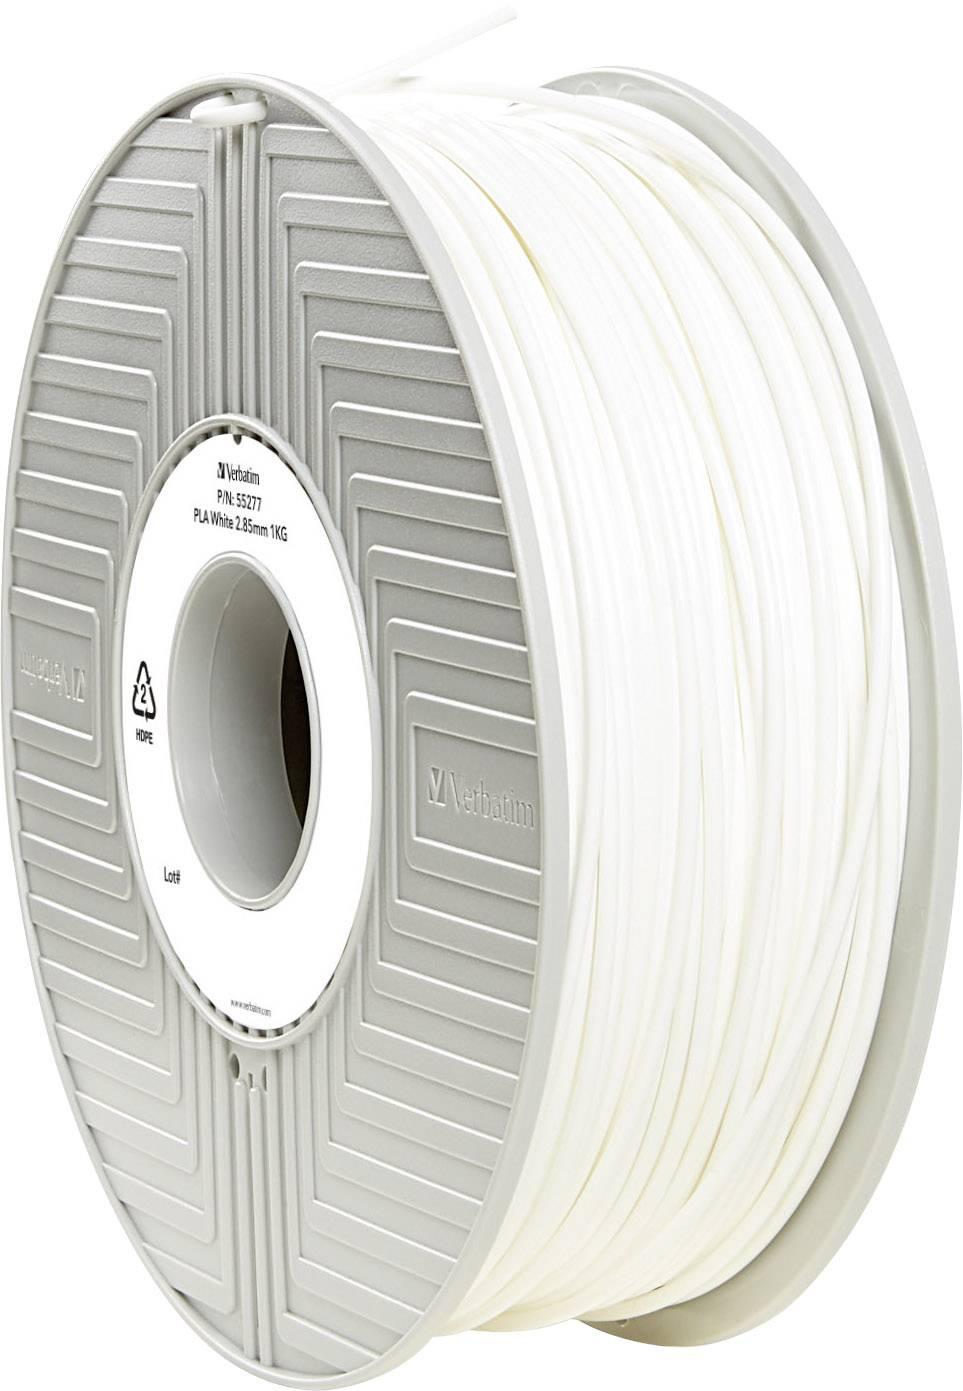 Vlákno pro 3D tiskárny Verbatim 55277, PLA plast, 2.85 mm, 1 kg, bílá